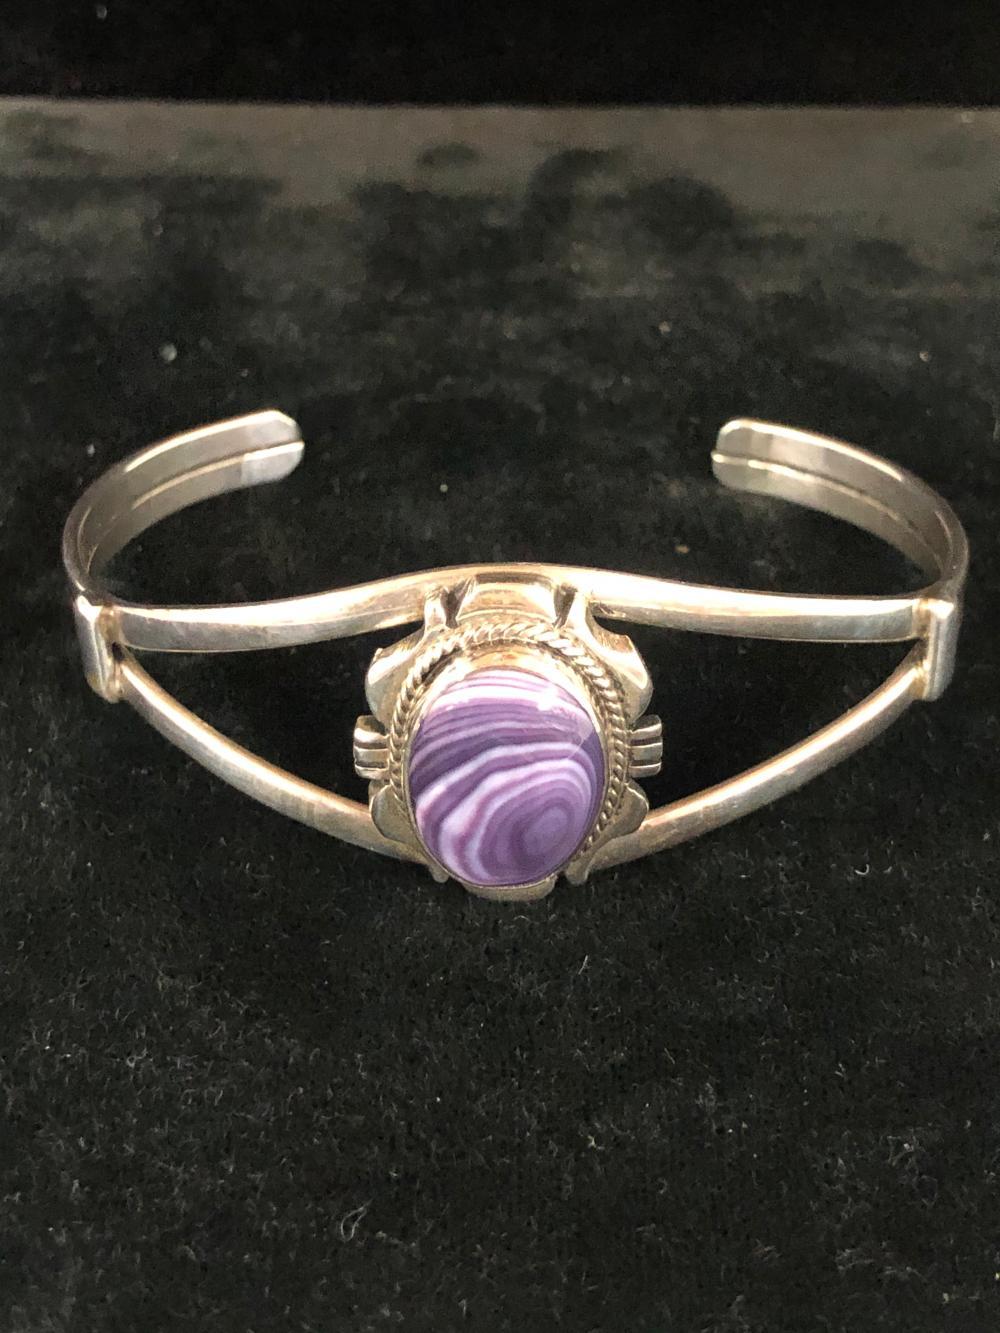 Wampum shell sterling silver cuff bracelet